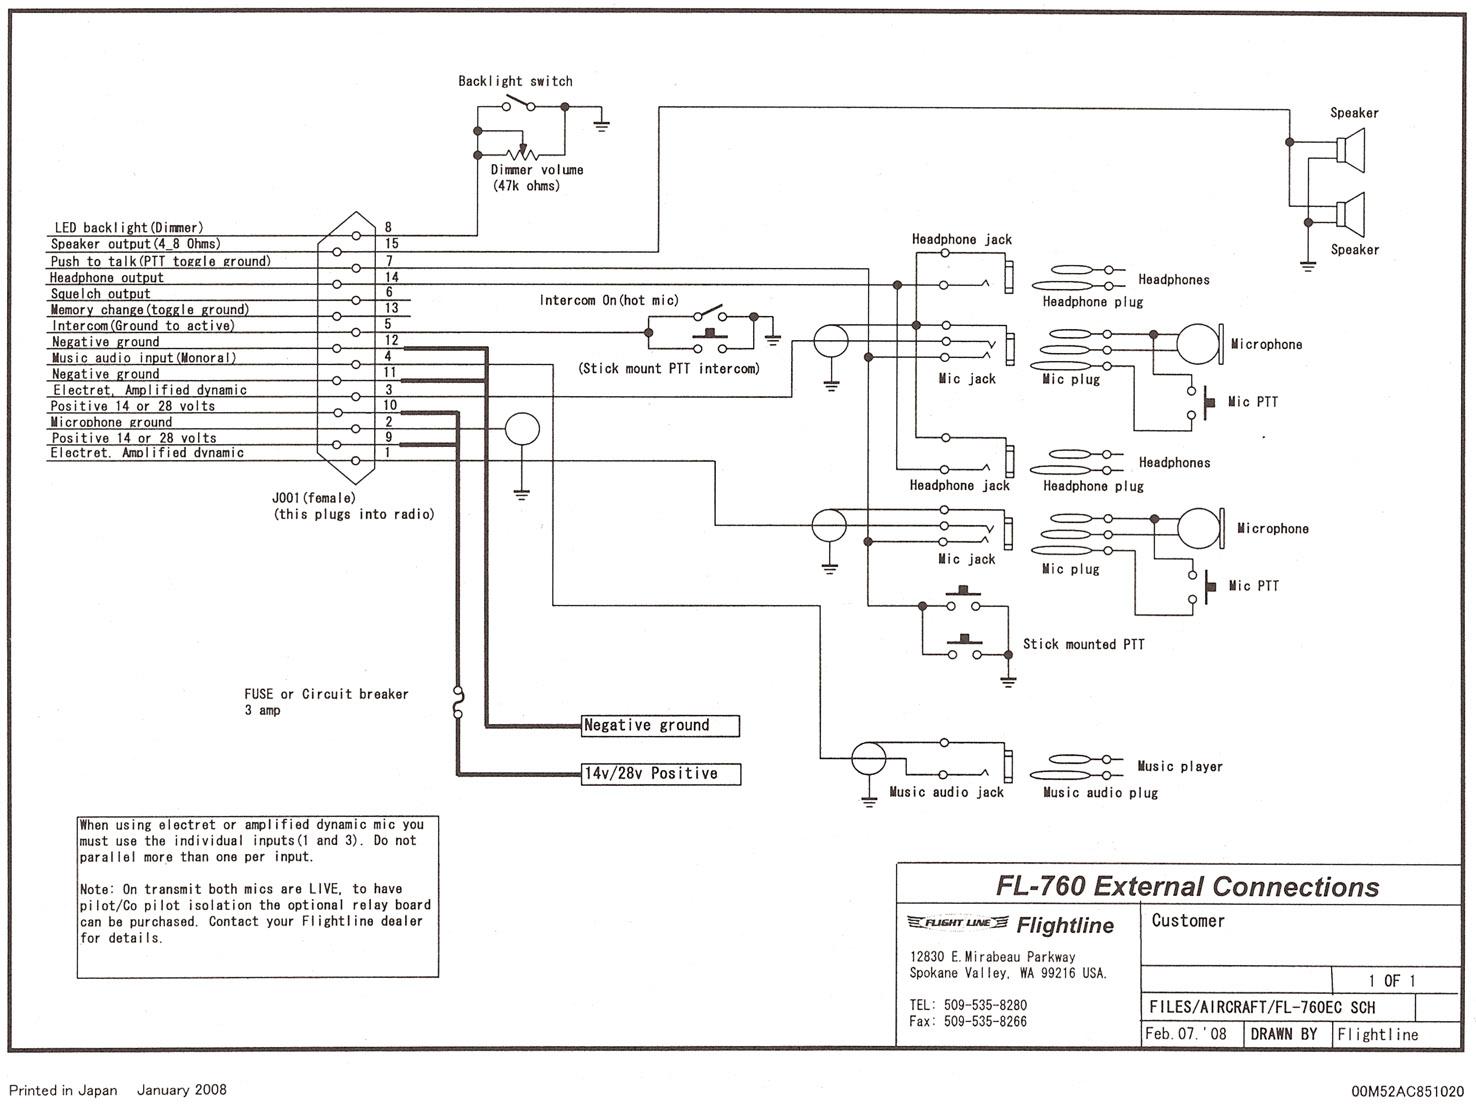 fl_760_wiring_diagram_179?resize\=665%2C499 jasco j12m20sp wiring diagram,j \u2022 indy500 co Basic Electrical Wiring Diagrams at reclaimingppi.co